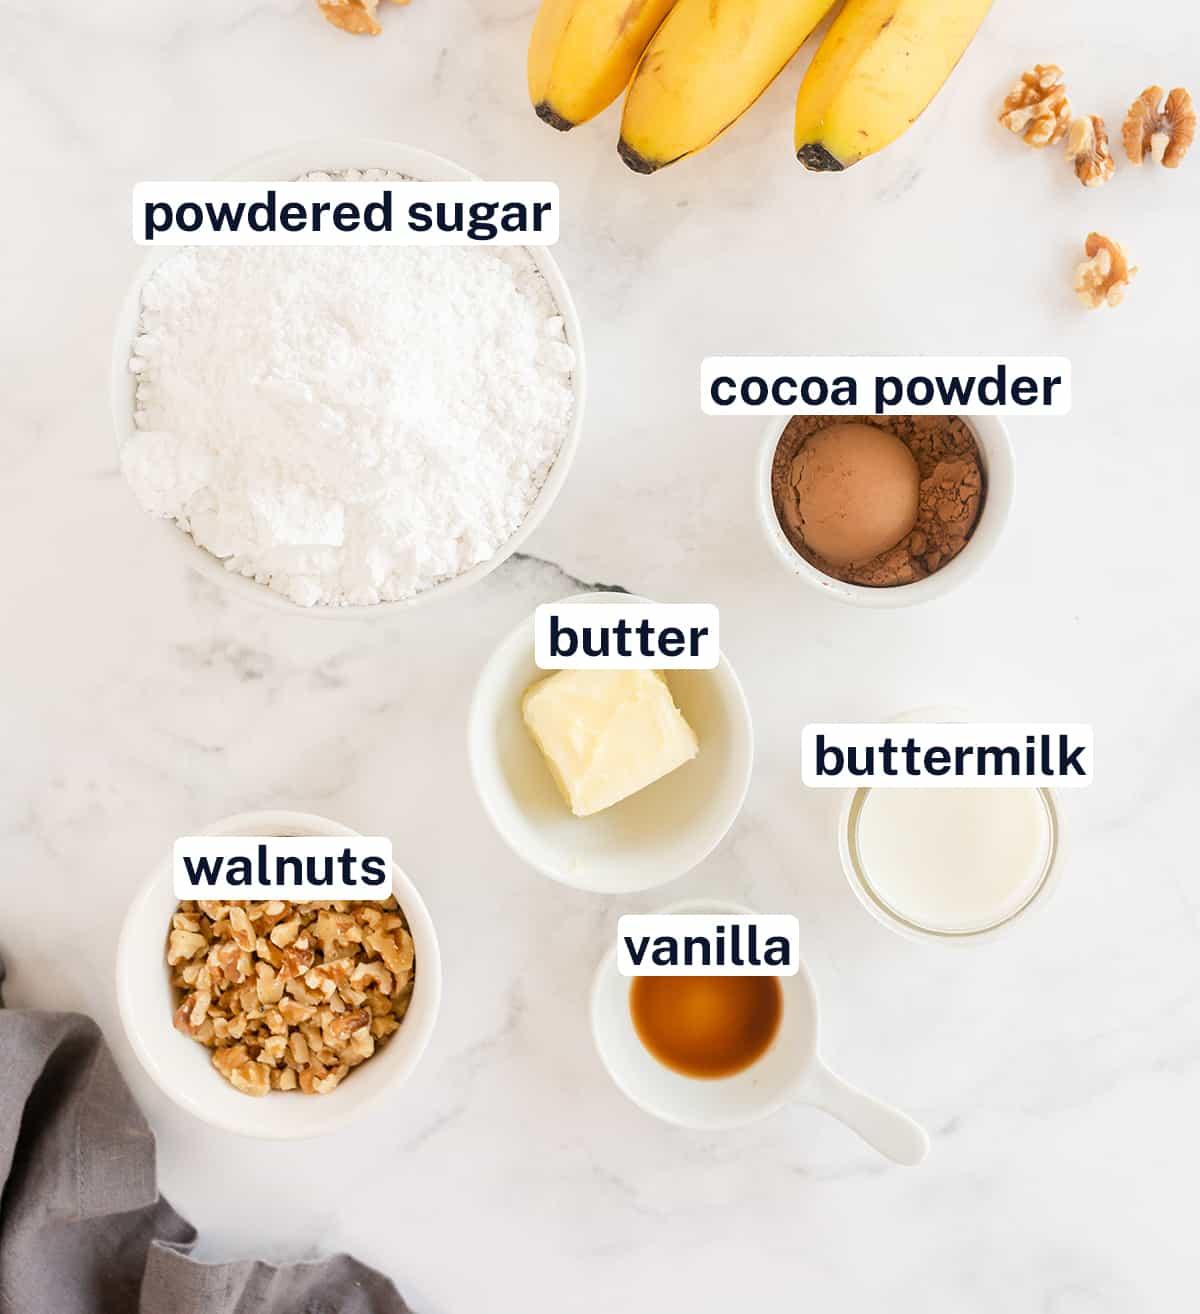 Ingredients for Chocolate Walnut Glaze with text overlay.